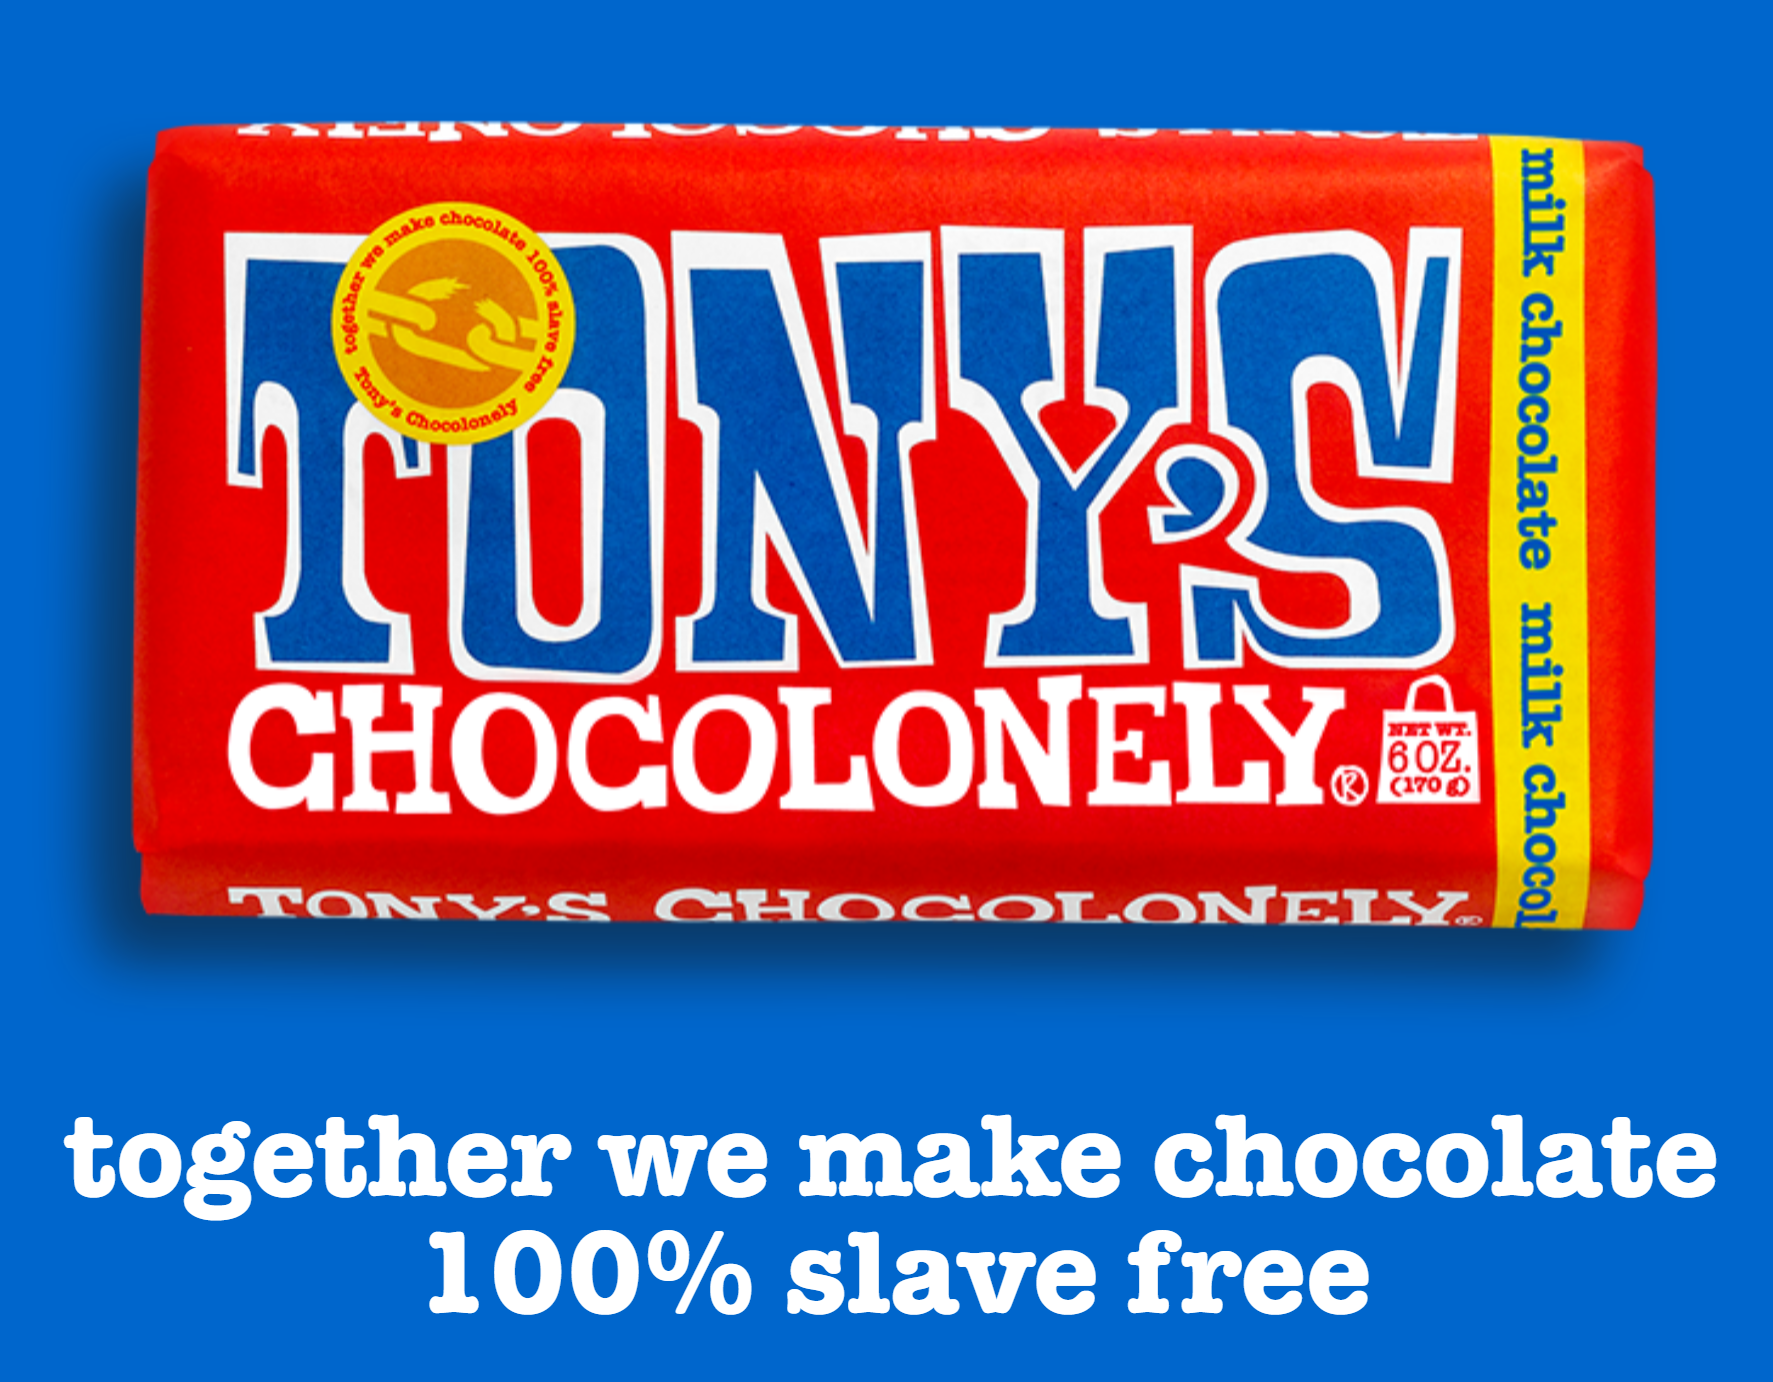 Tony's Chocolonely chocolate bars